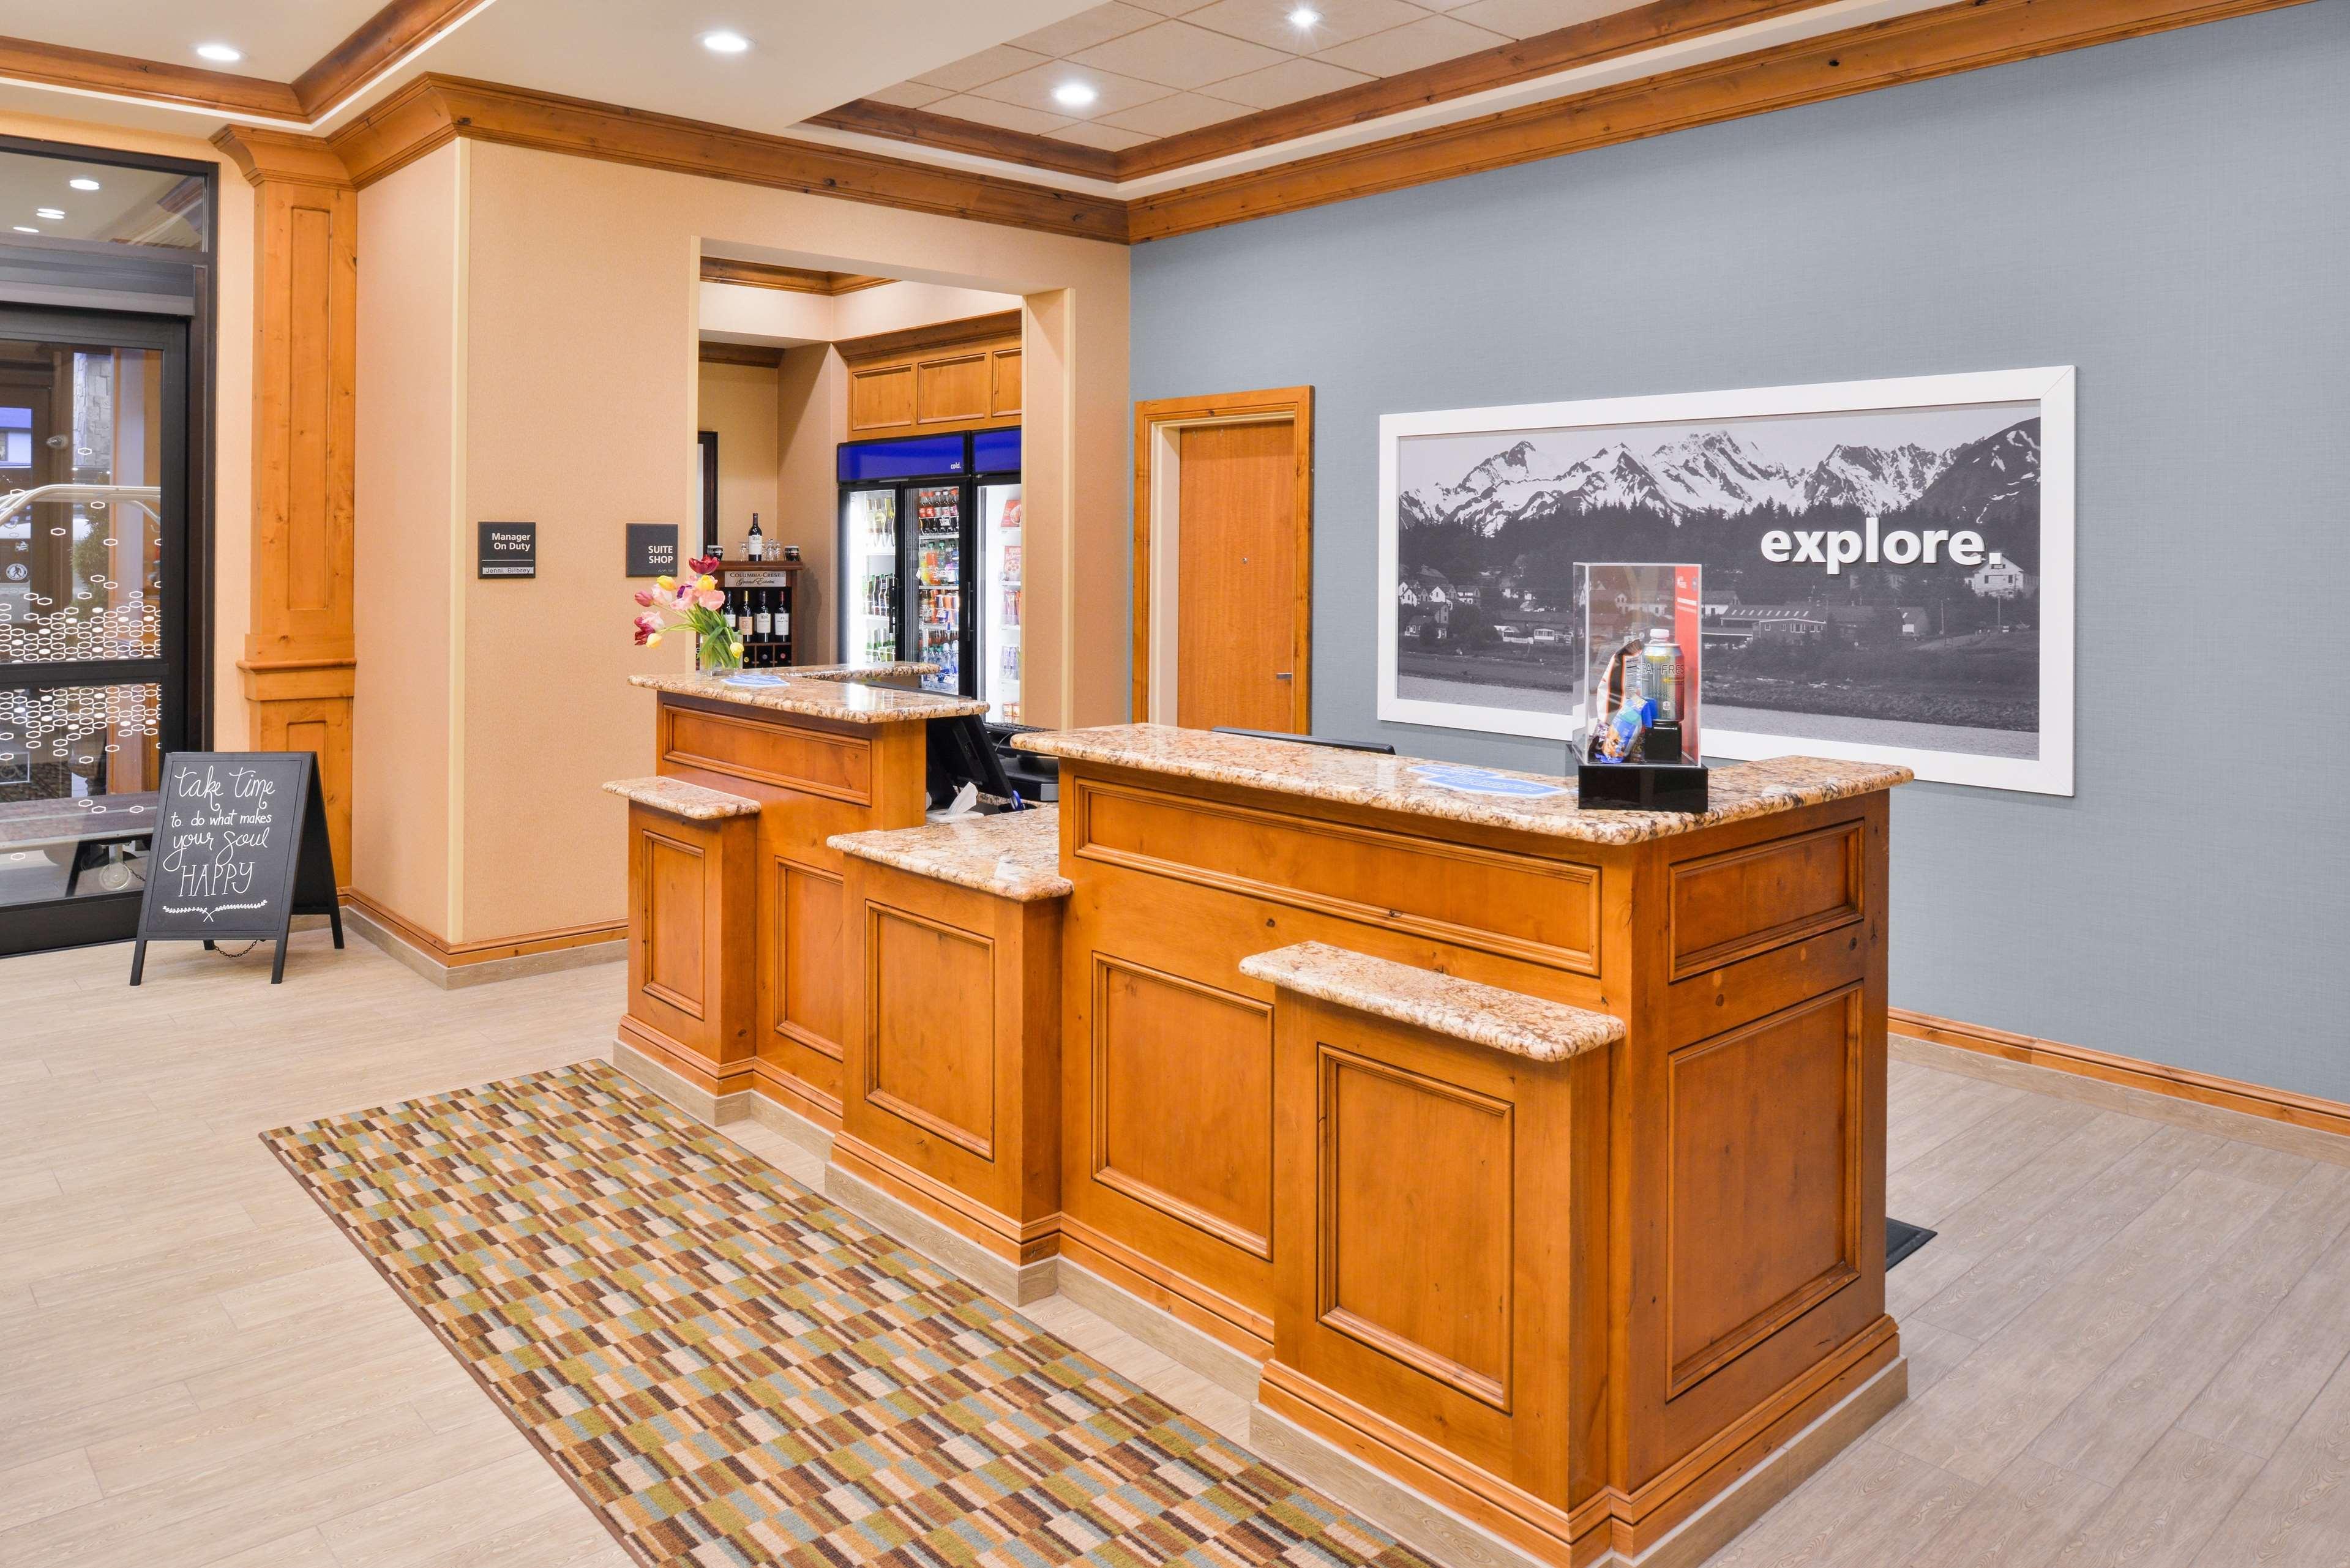 Hampton Inn & Suites Coeur d' Alene image 4